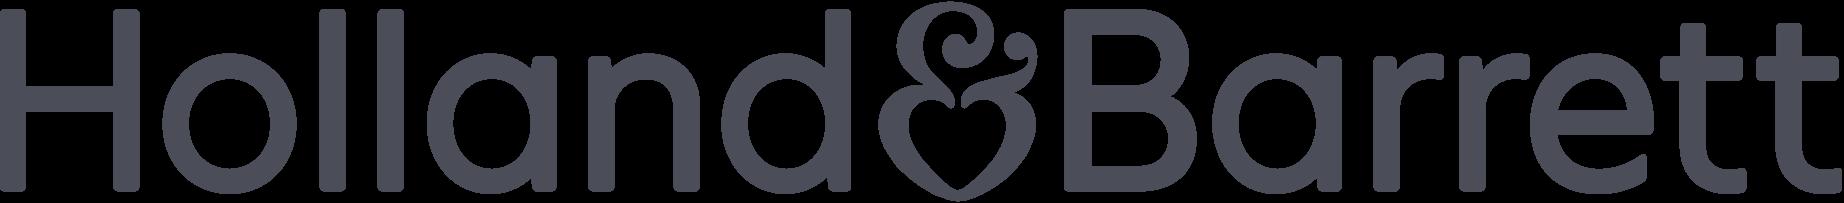 Holland & Barrett - UK logo